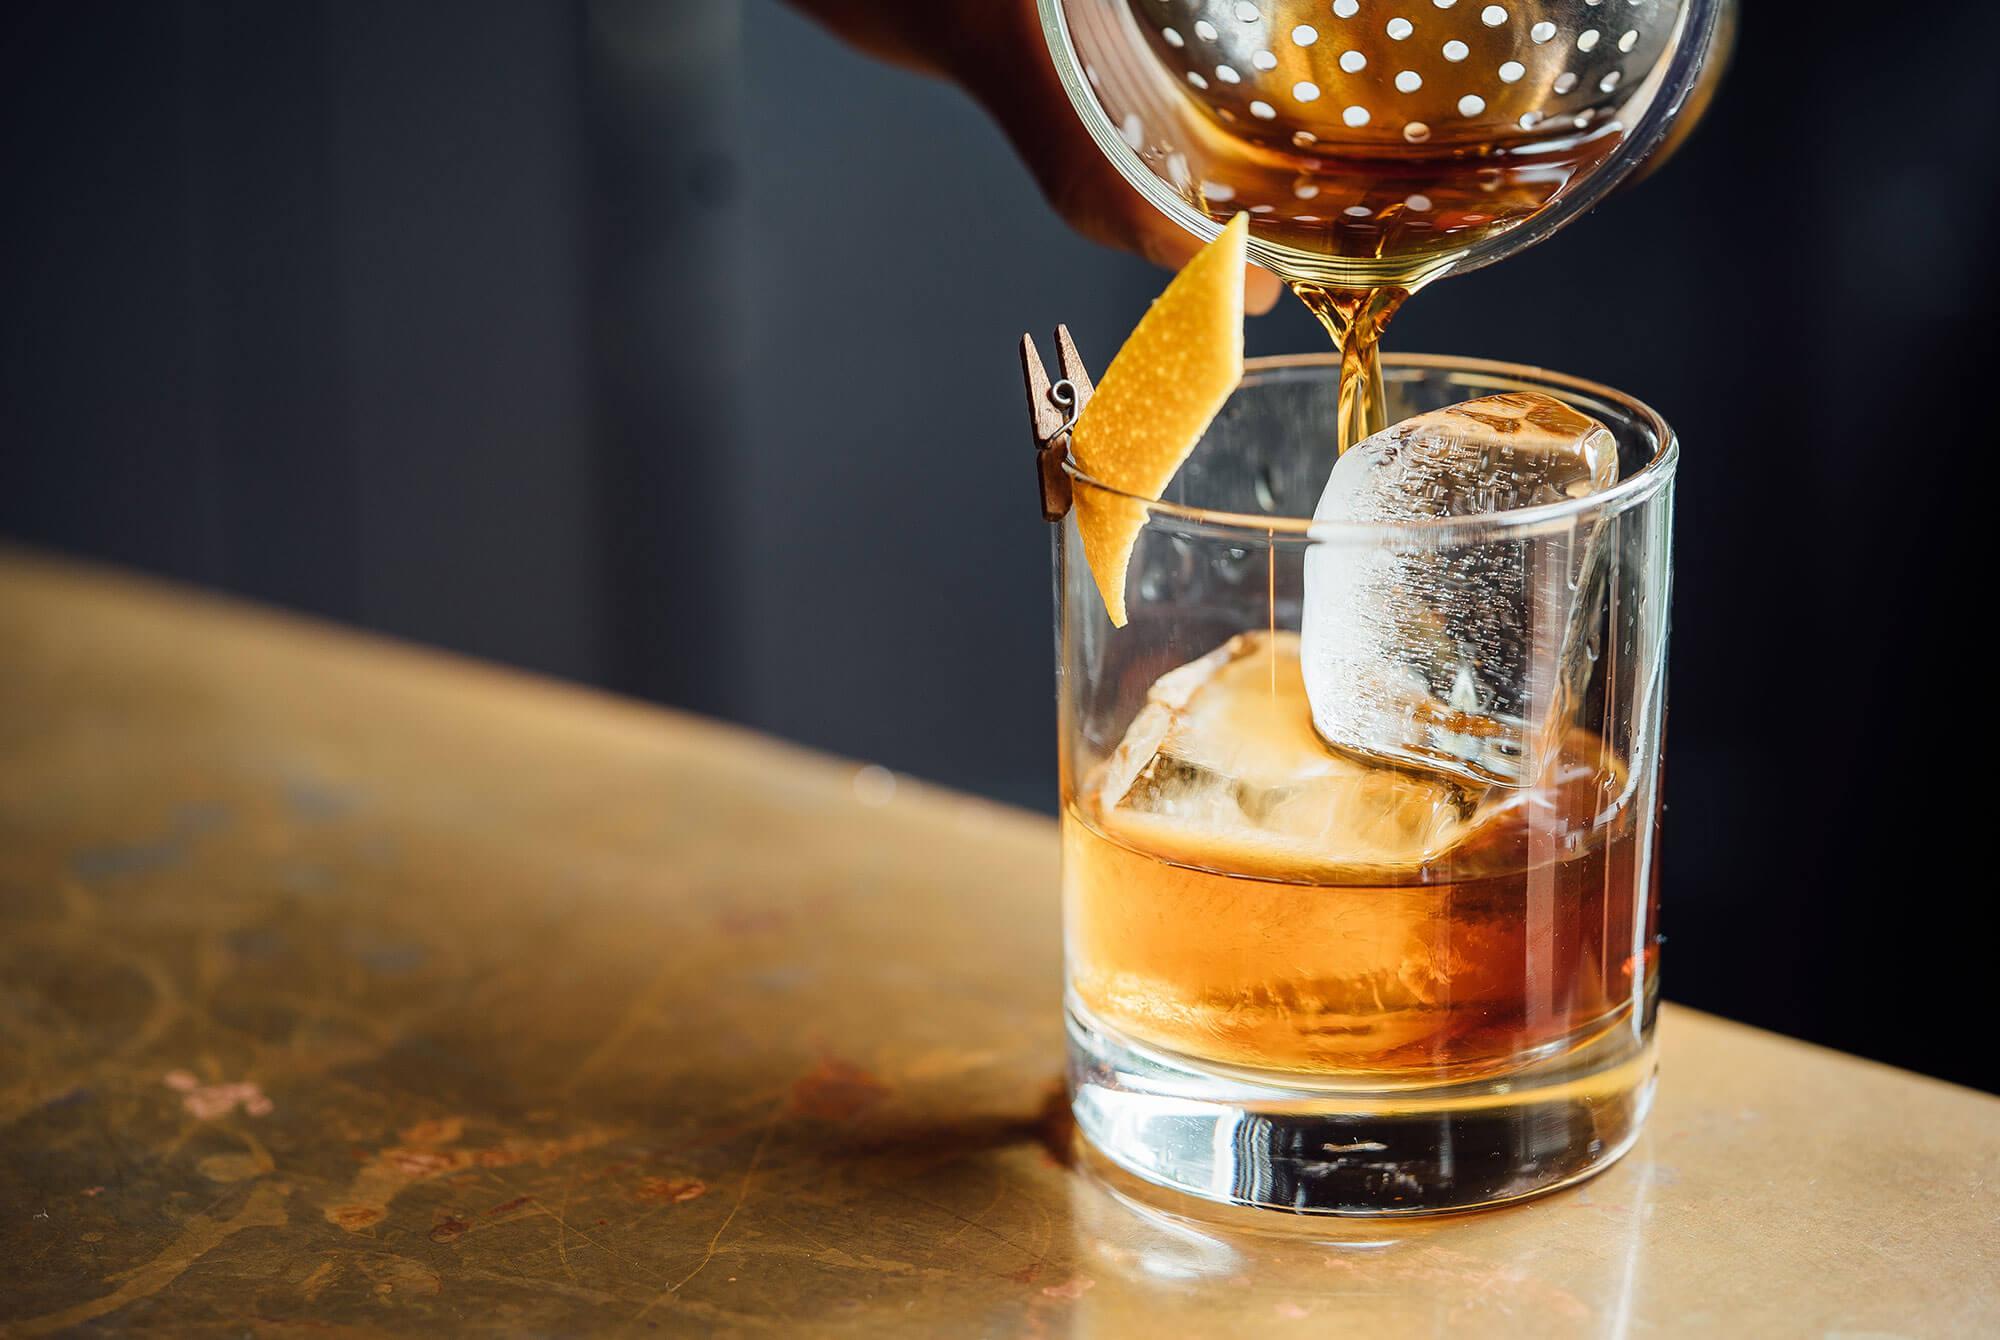 5 лучших виски для любителей пива